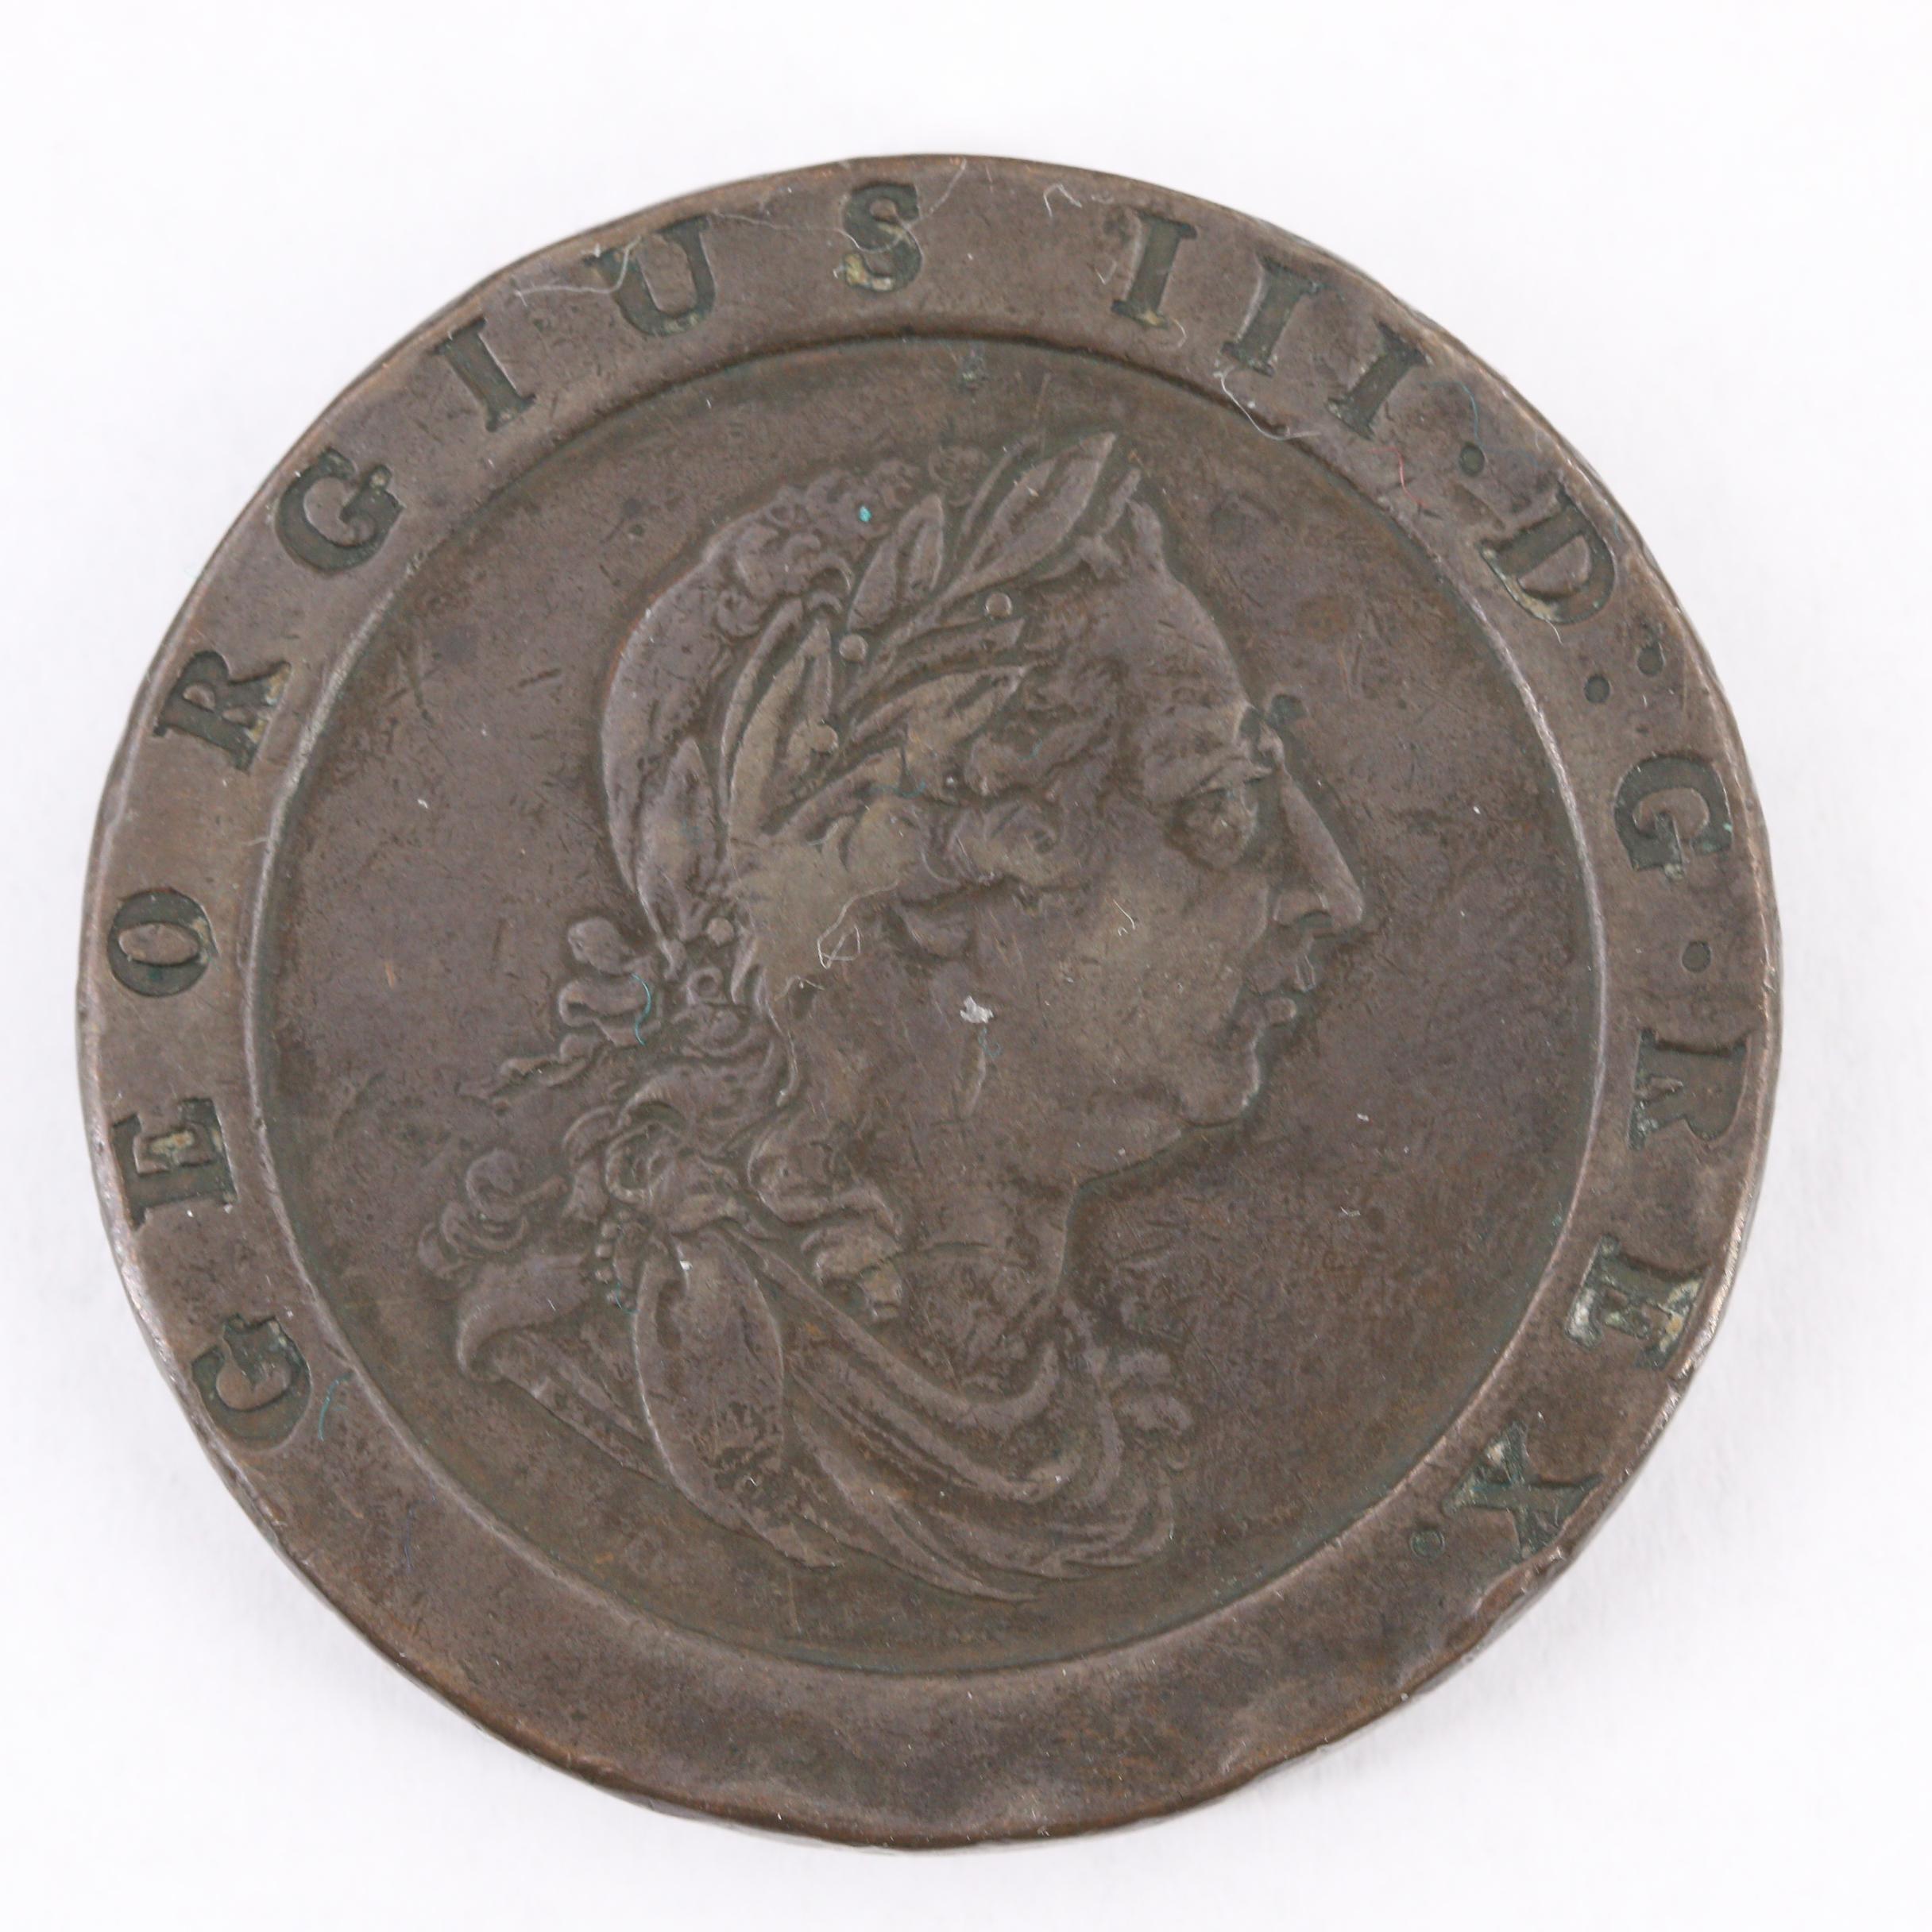 1797 George III Copper Cartwheel Two Pence Coin